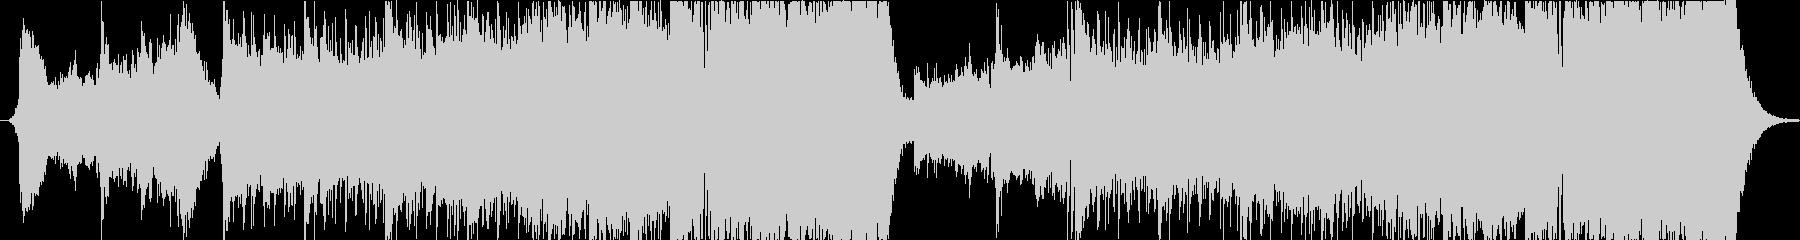 Dubstep Action Musicの未再生の波形